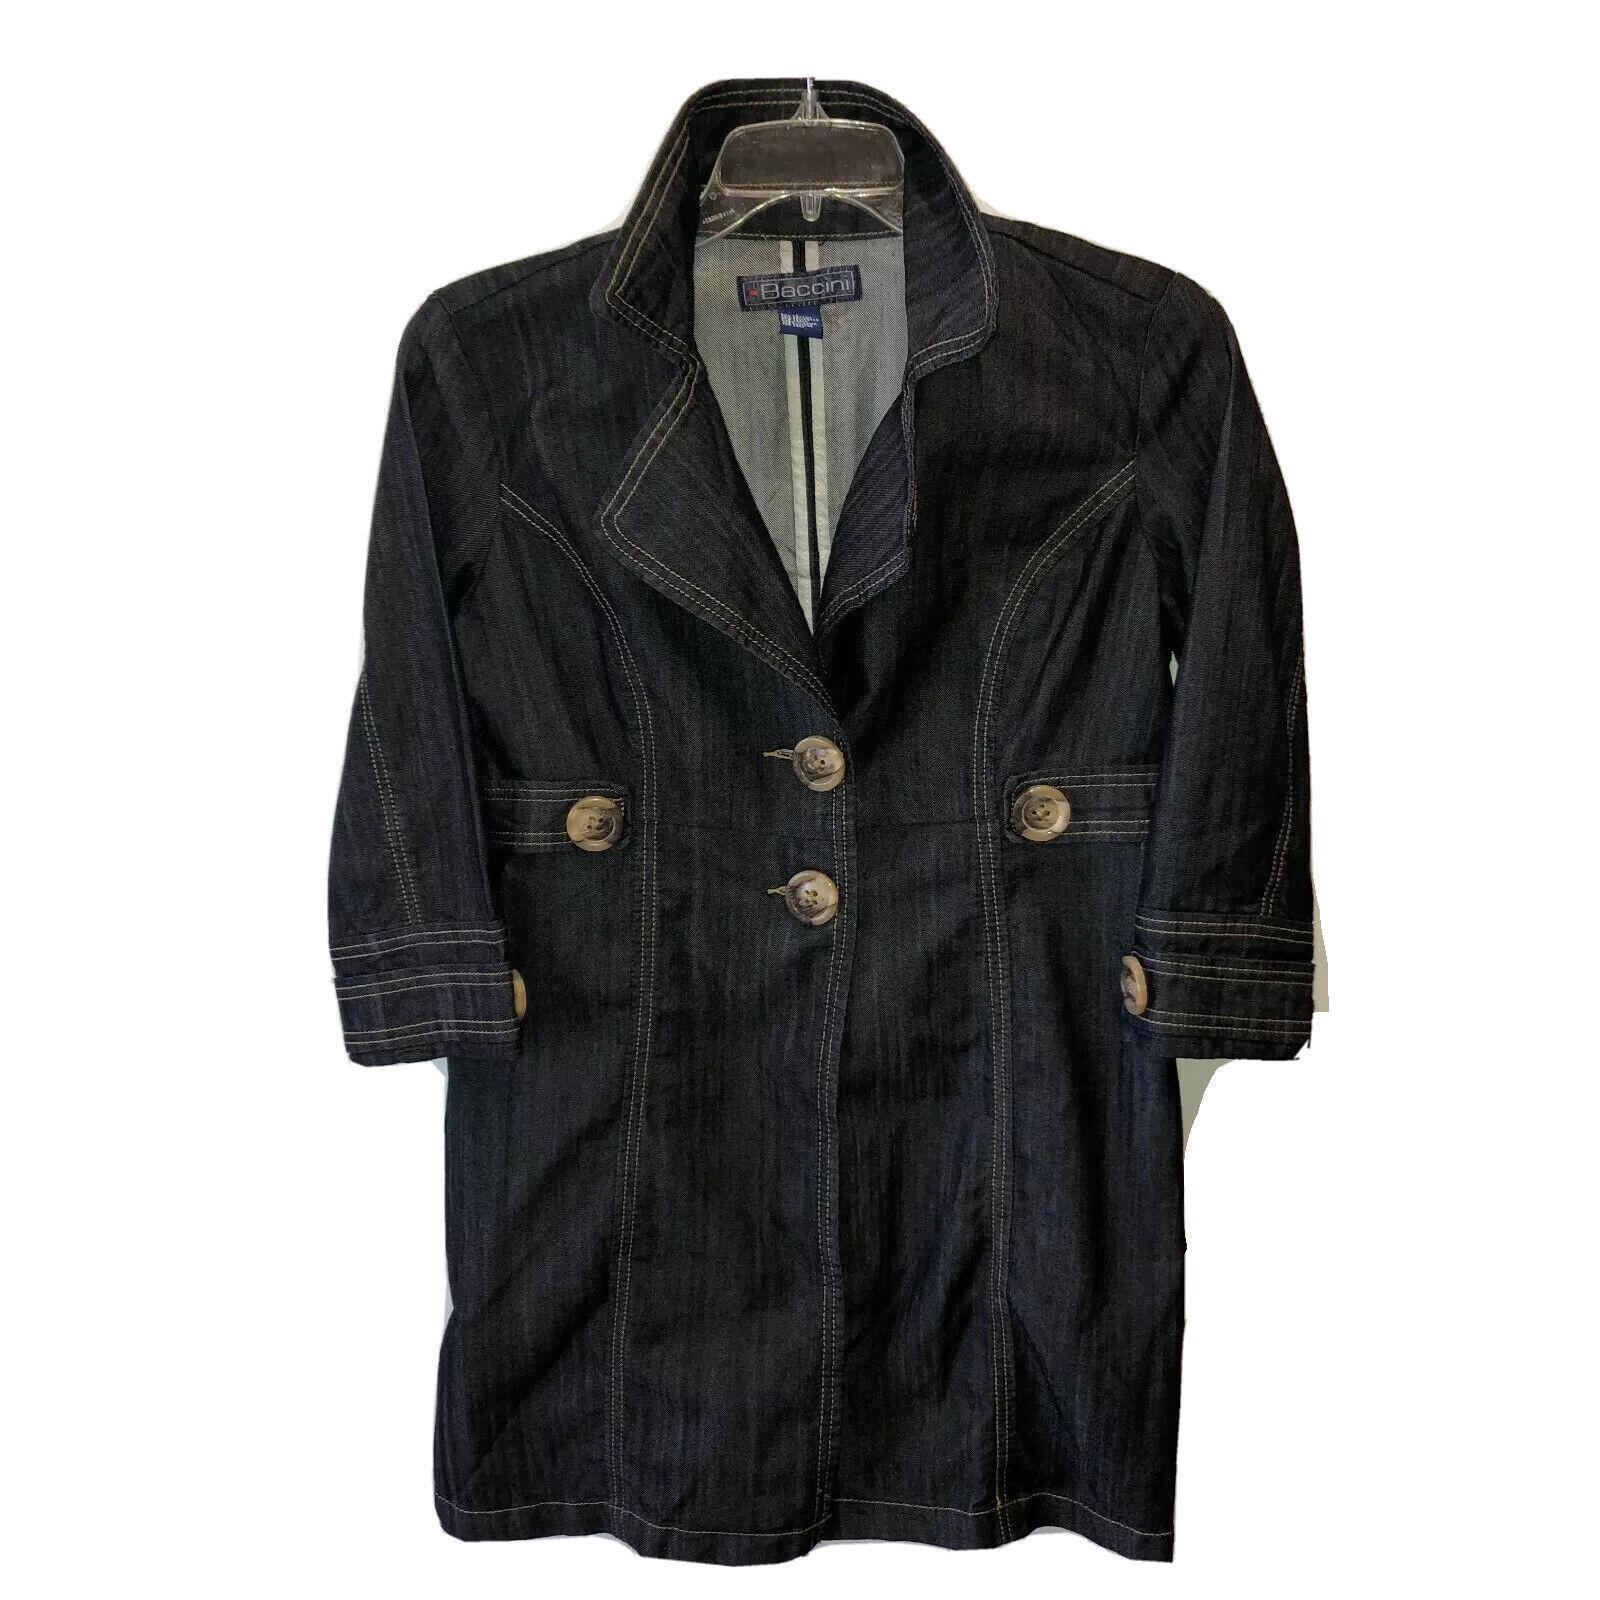 Baccini Womens Medium Black 3/4 Sleeve Button Front Denim Jean Jacket Coat Top M